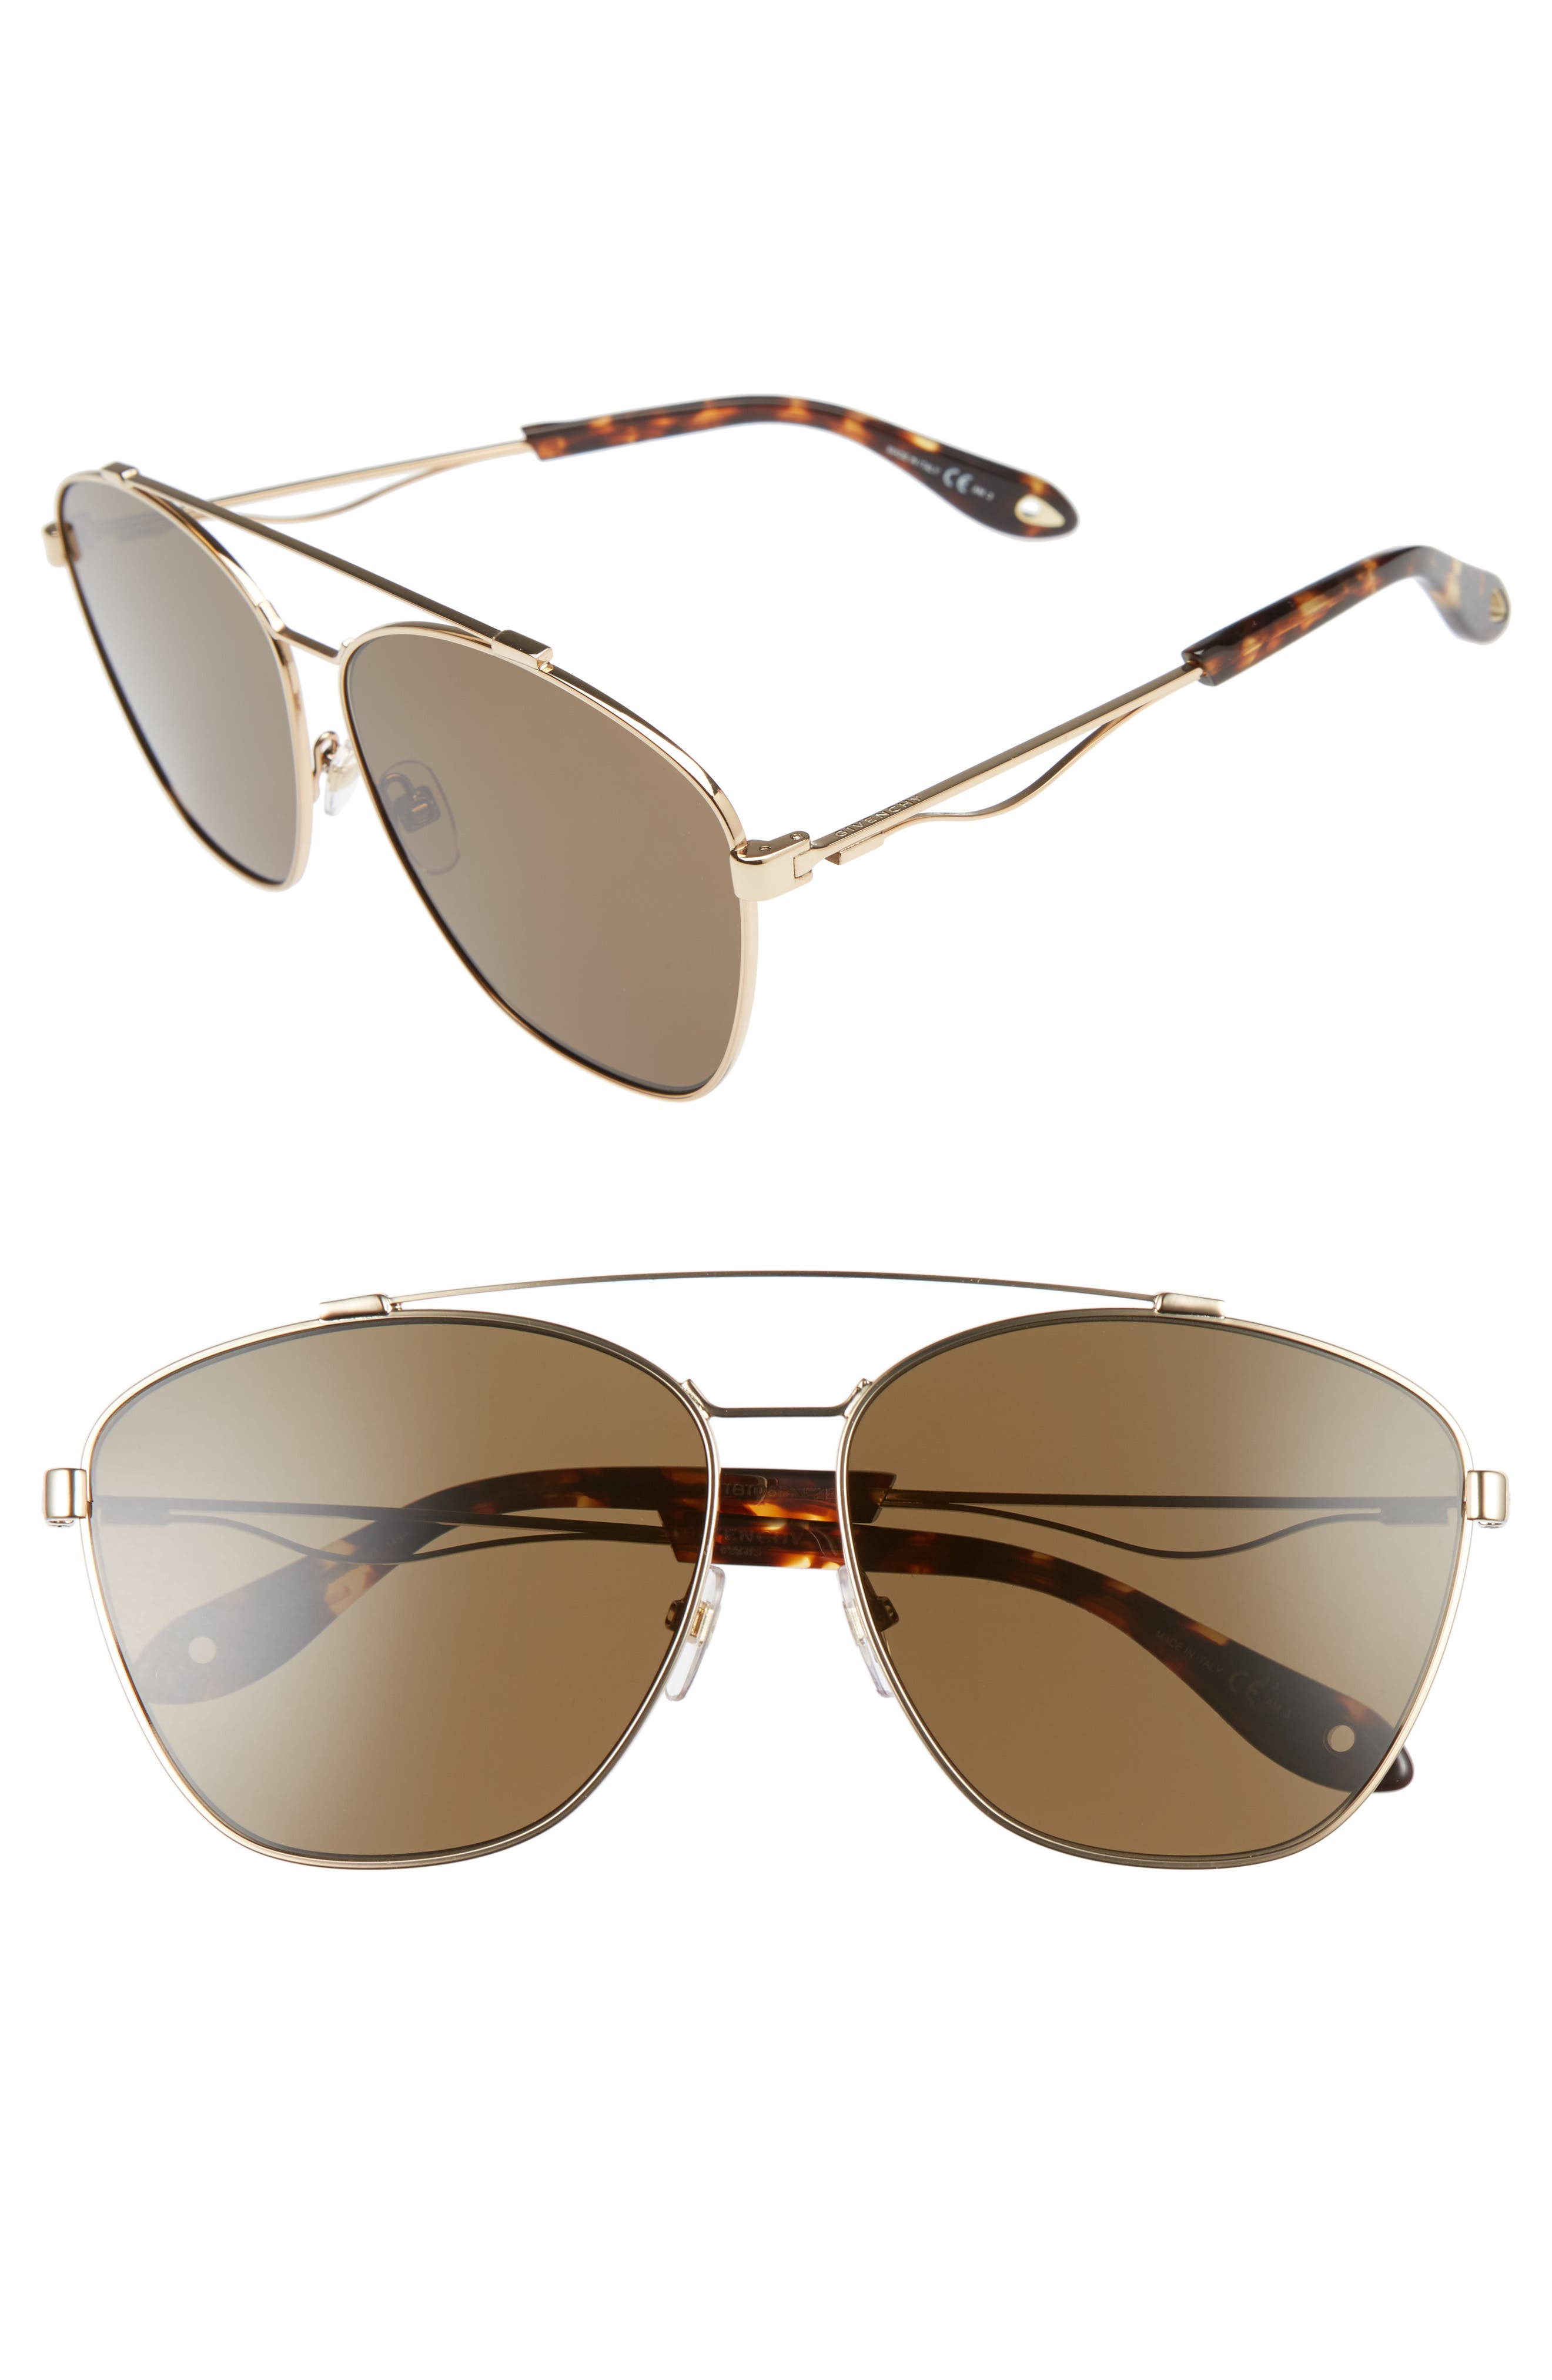 65mm Navigator Sunglasses,                         Main,                         color, Gold